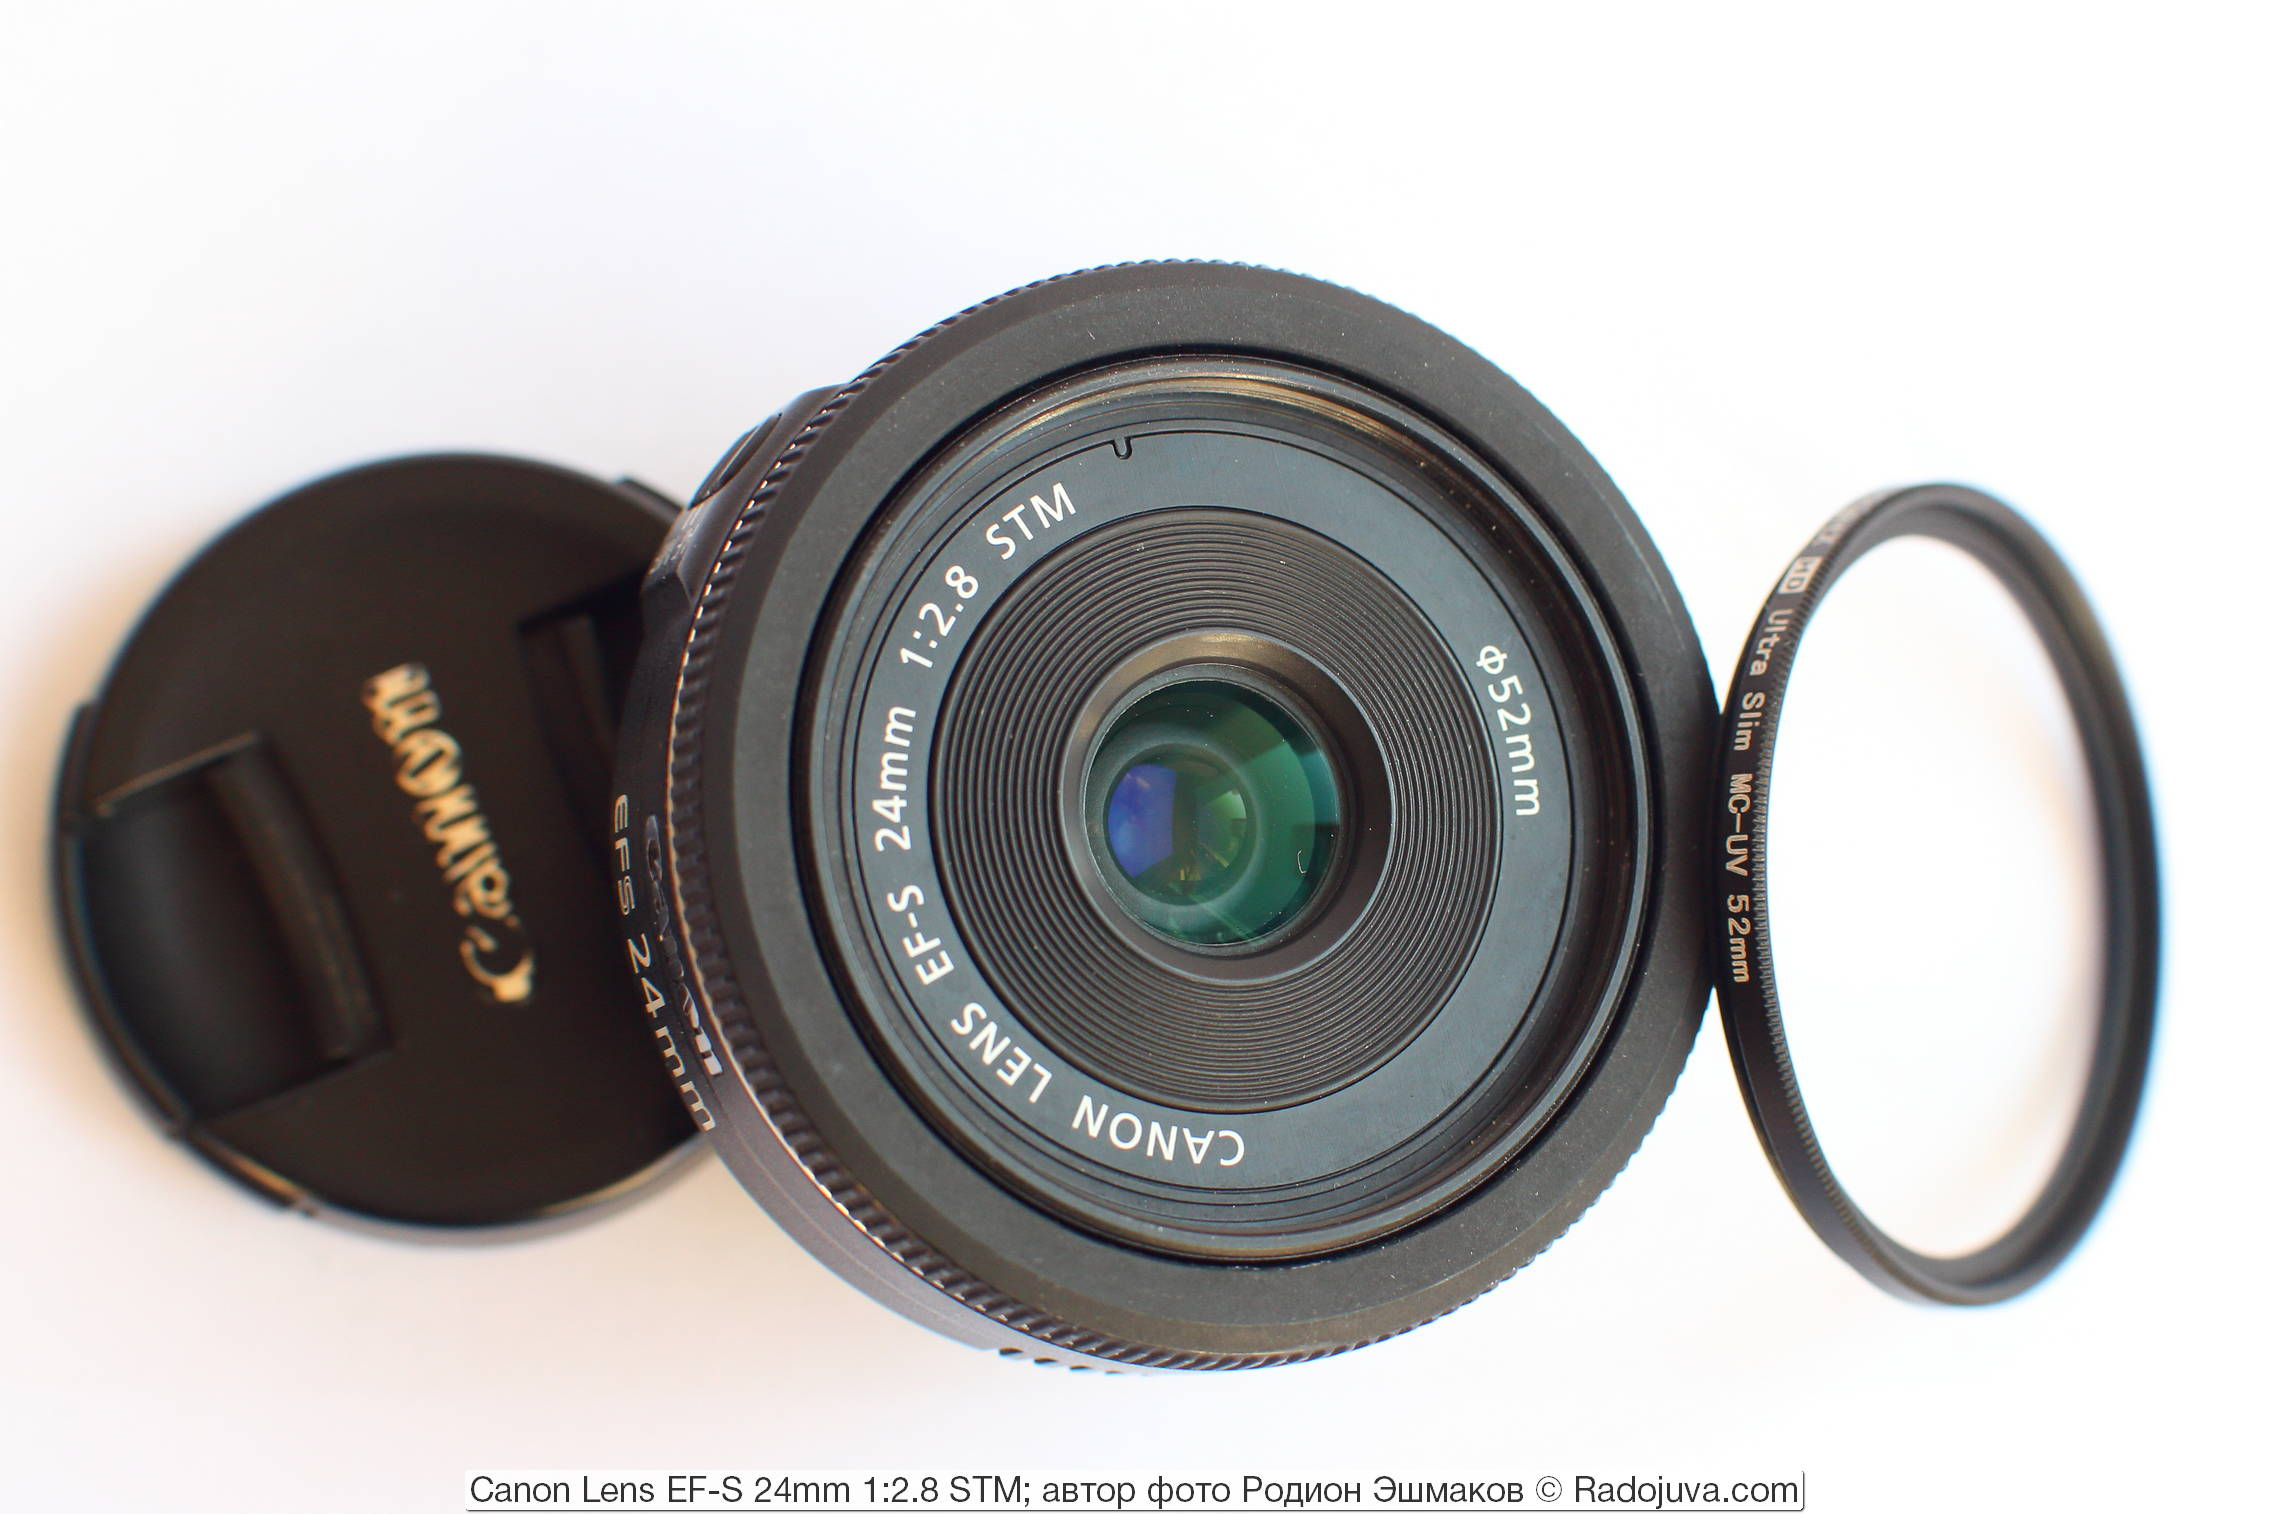 Canon Lens EF-S 24mm 1:2.8 STM